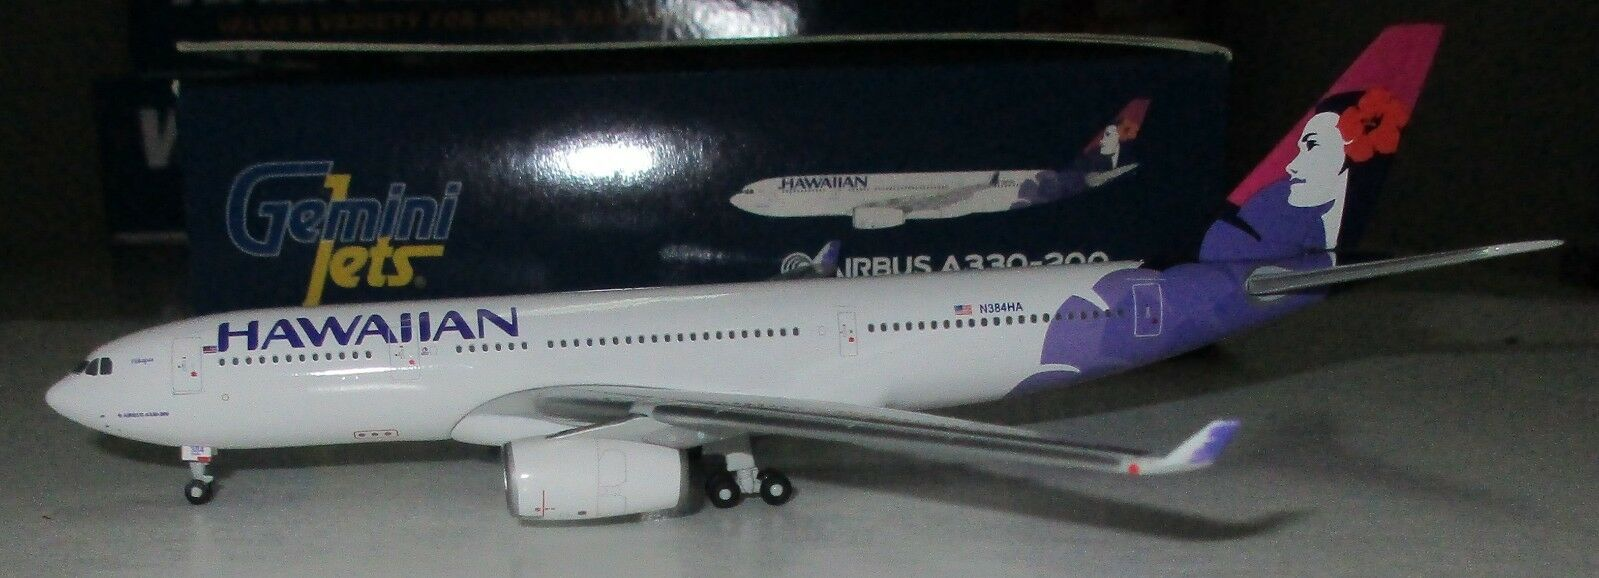 Gemini Jets 1 1 1 400  Hawaiian Airlines A330-200   N384HA   - GJHAL1281 2e941e